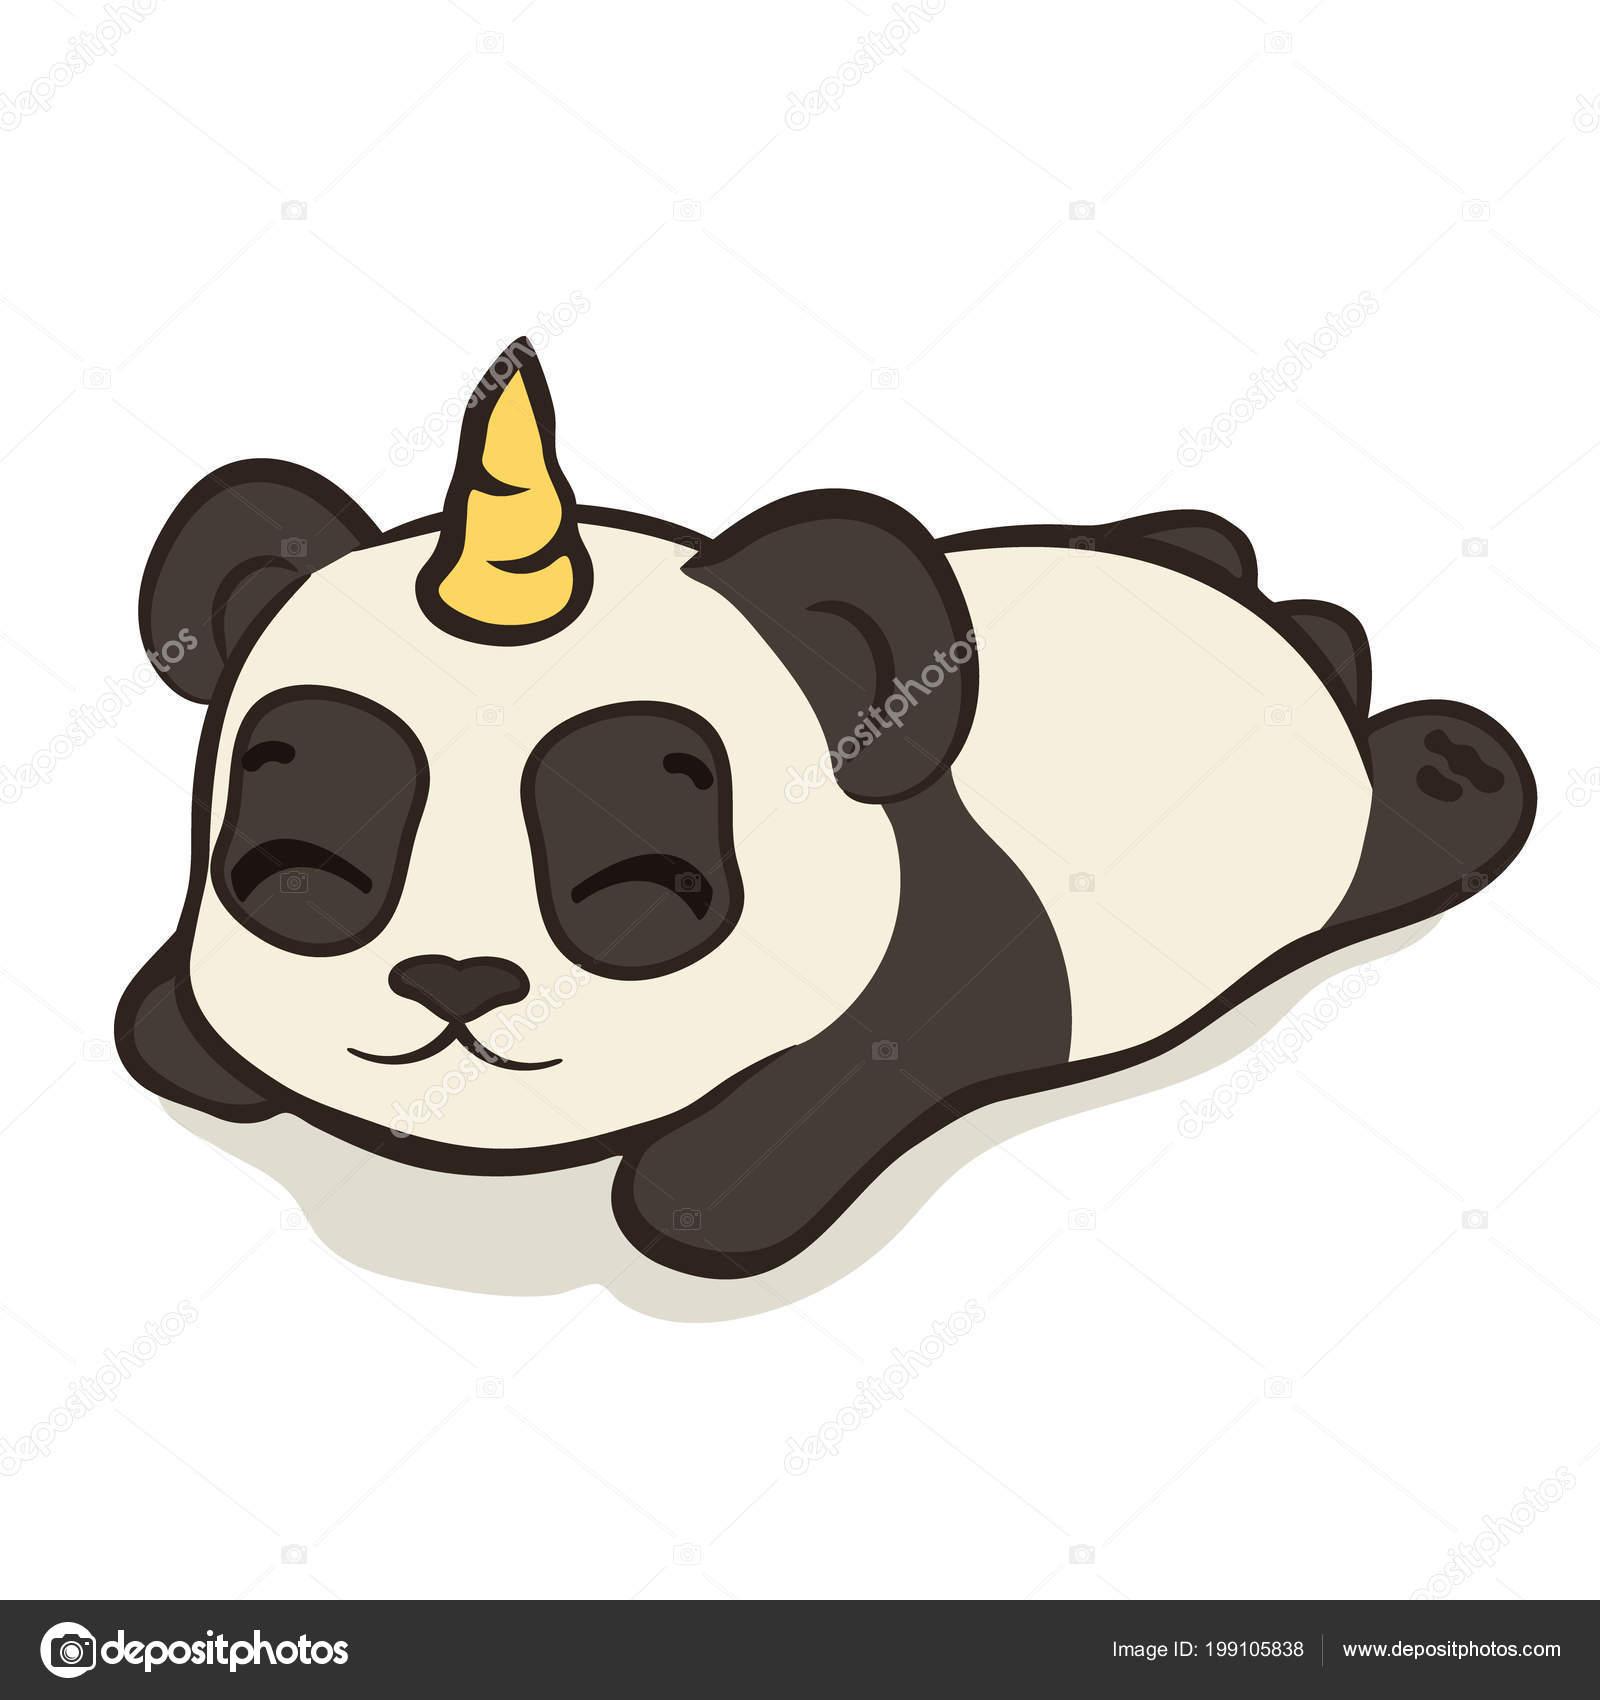 df283e3d4894f2 Niedlicher Panda Bär Charakter Mit Einhorn Horn Isoliert Schlafende Panda —  Stockvektor